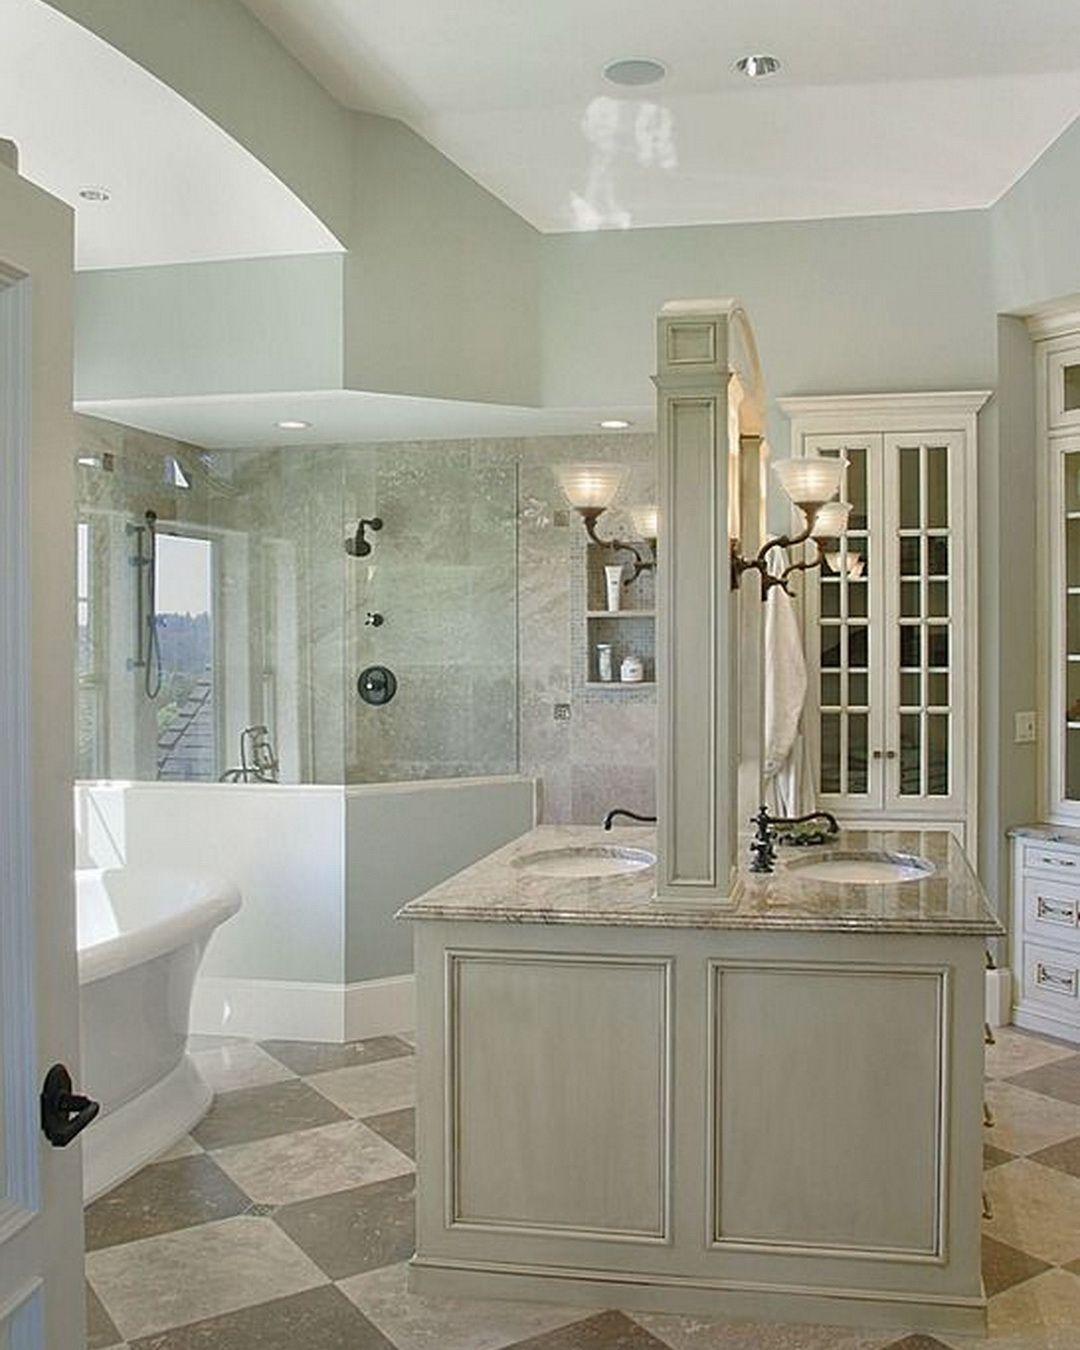 12 luxurious bathroom design ideas home bathroom master rh pinterest ch